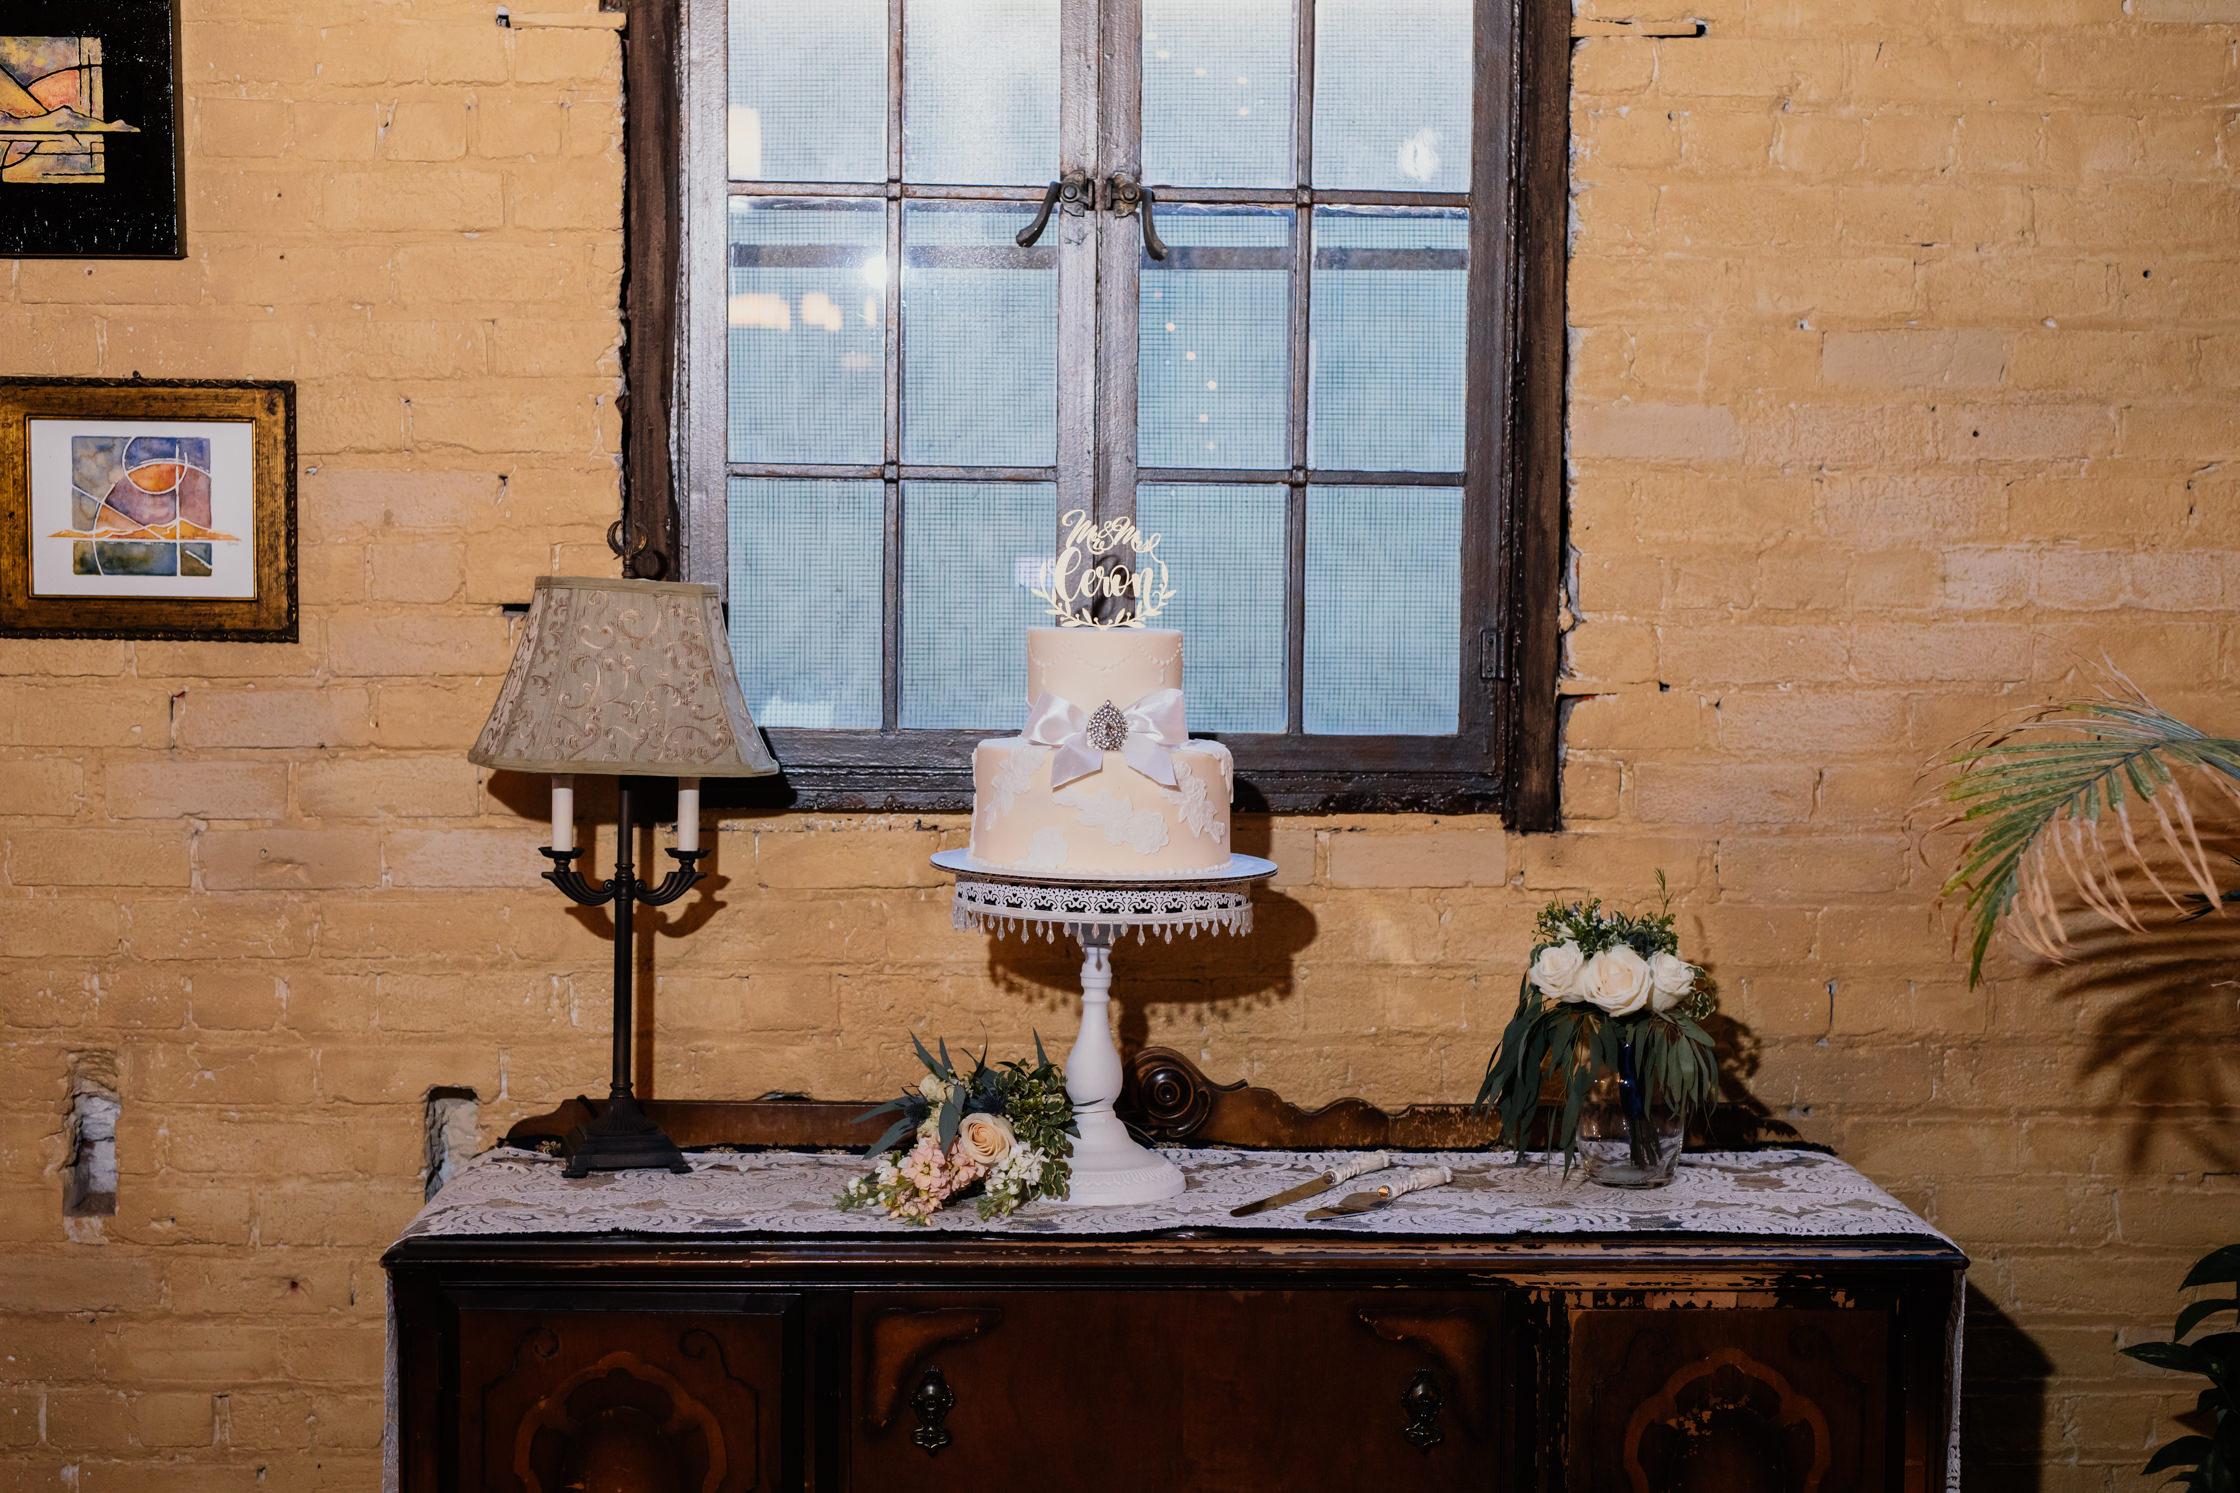 luis_joanna_wedding-79.jpg